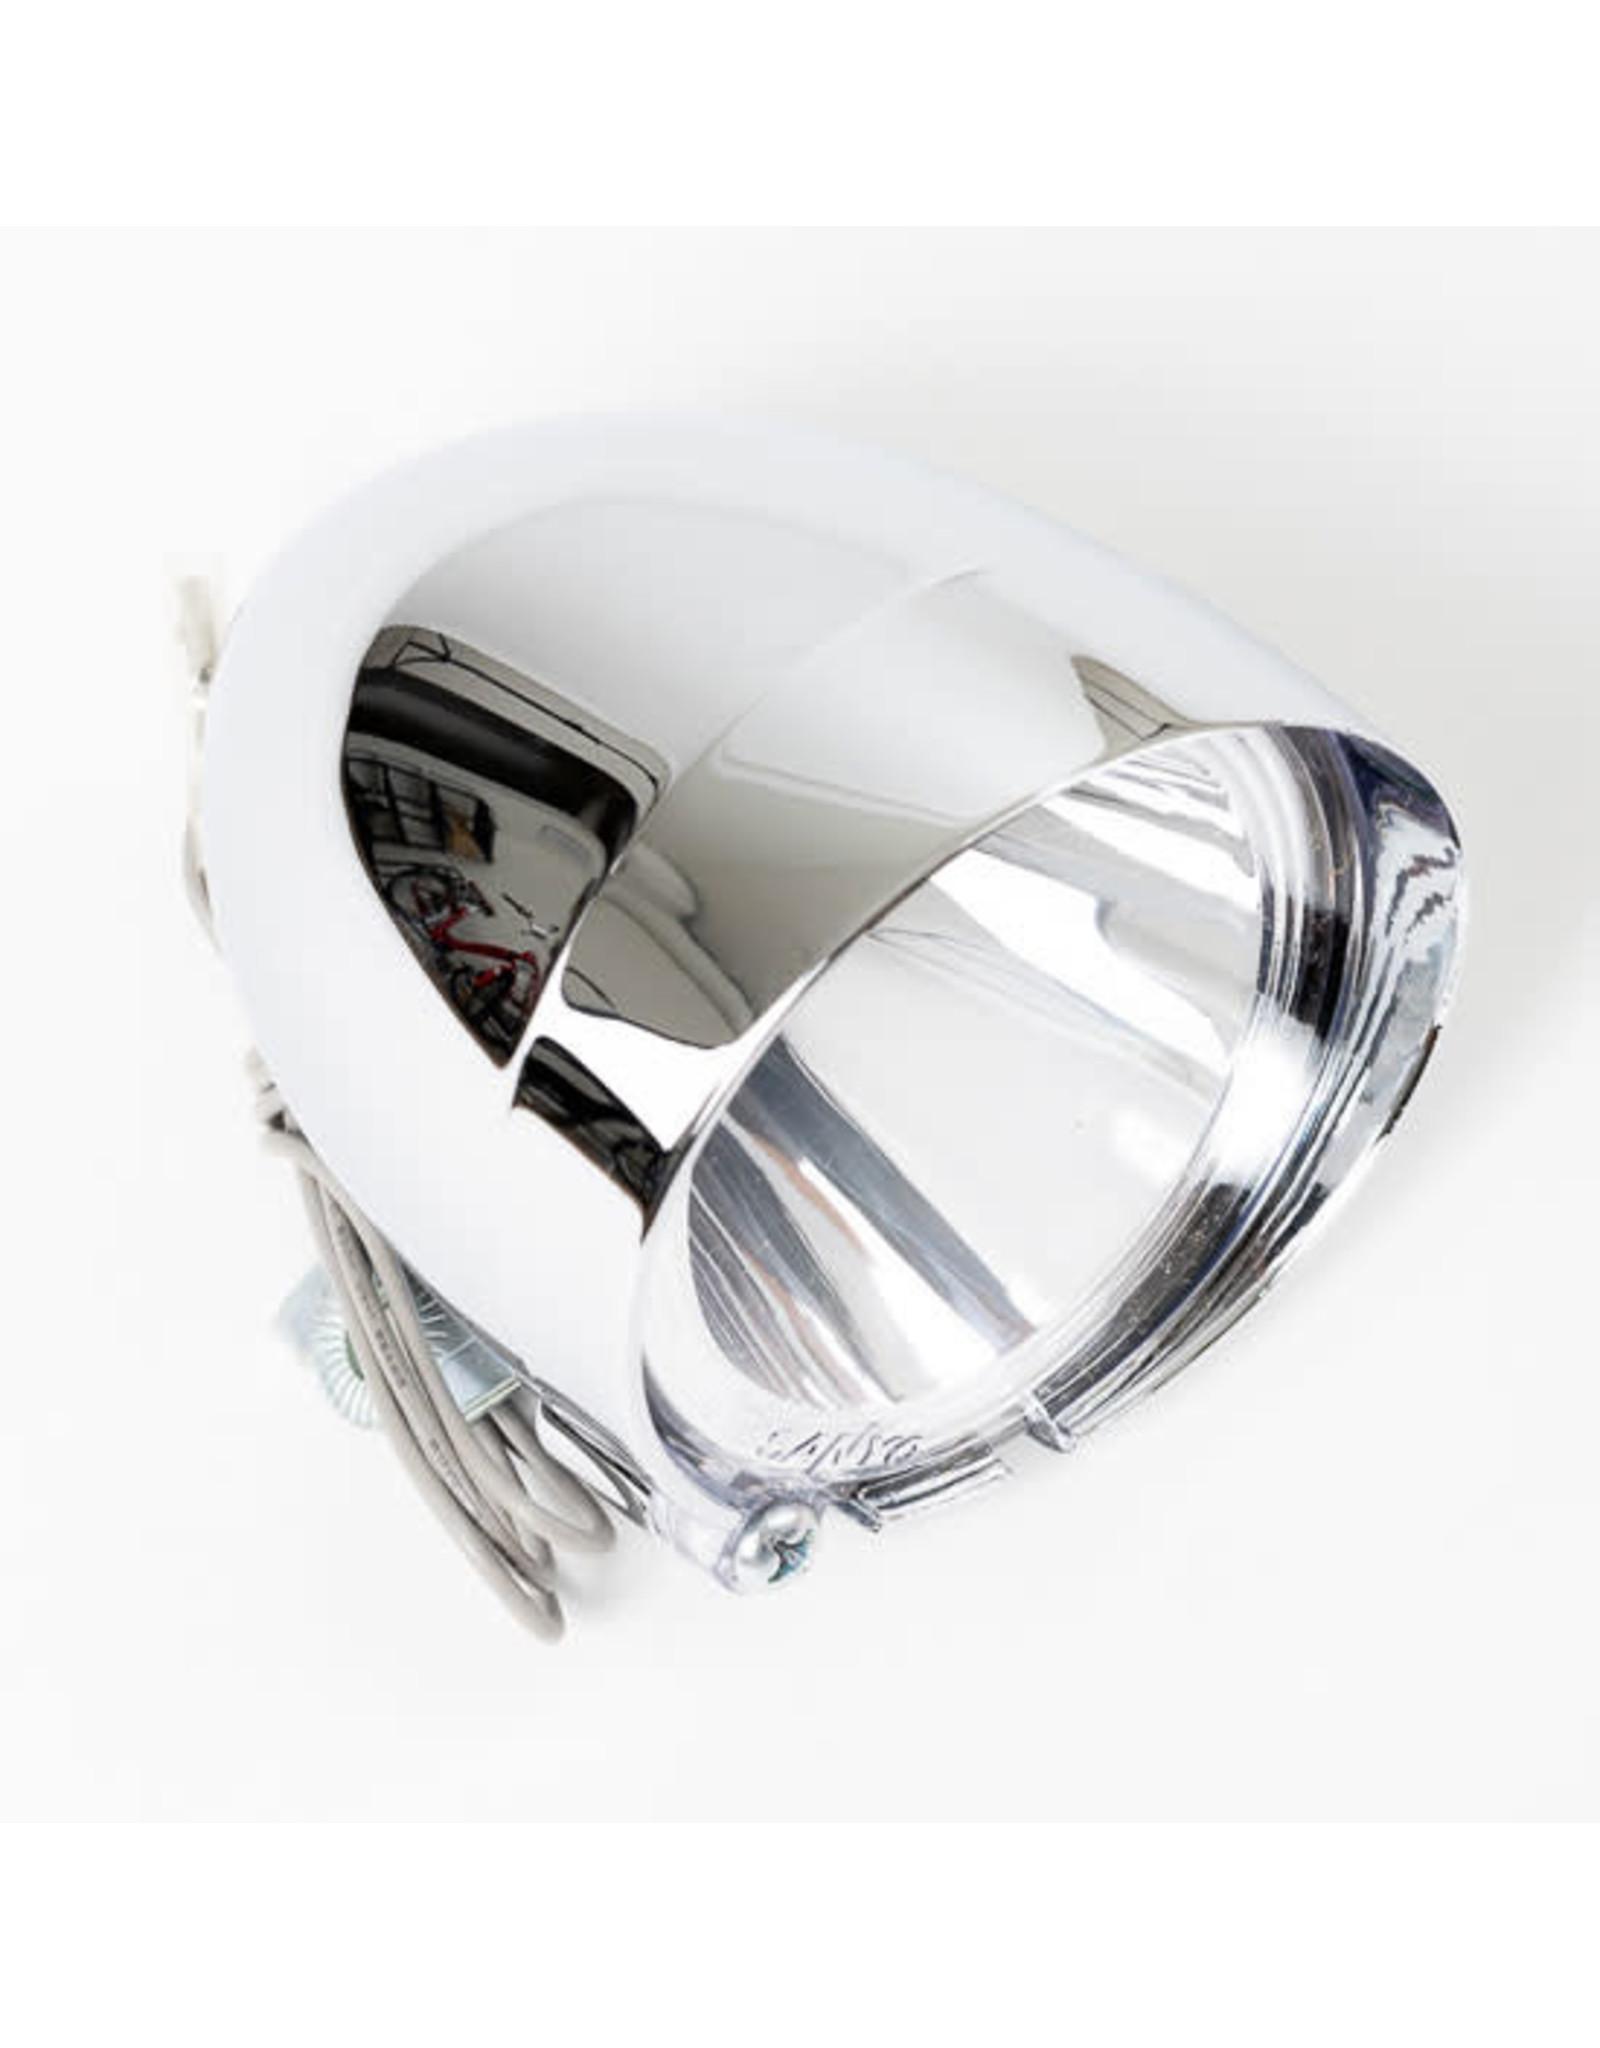 SANYO 12V Front Light